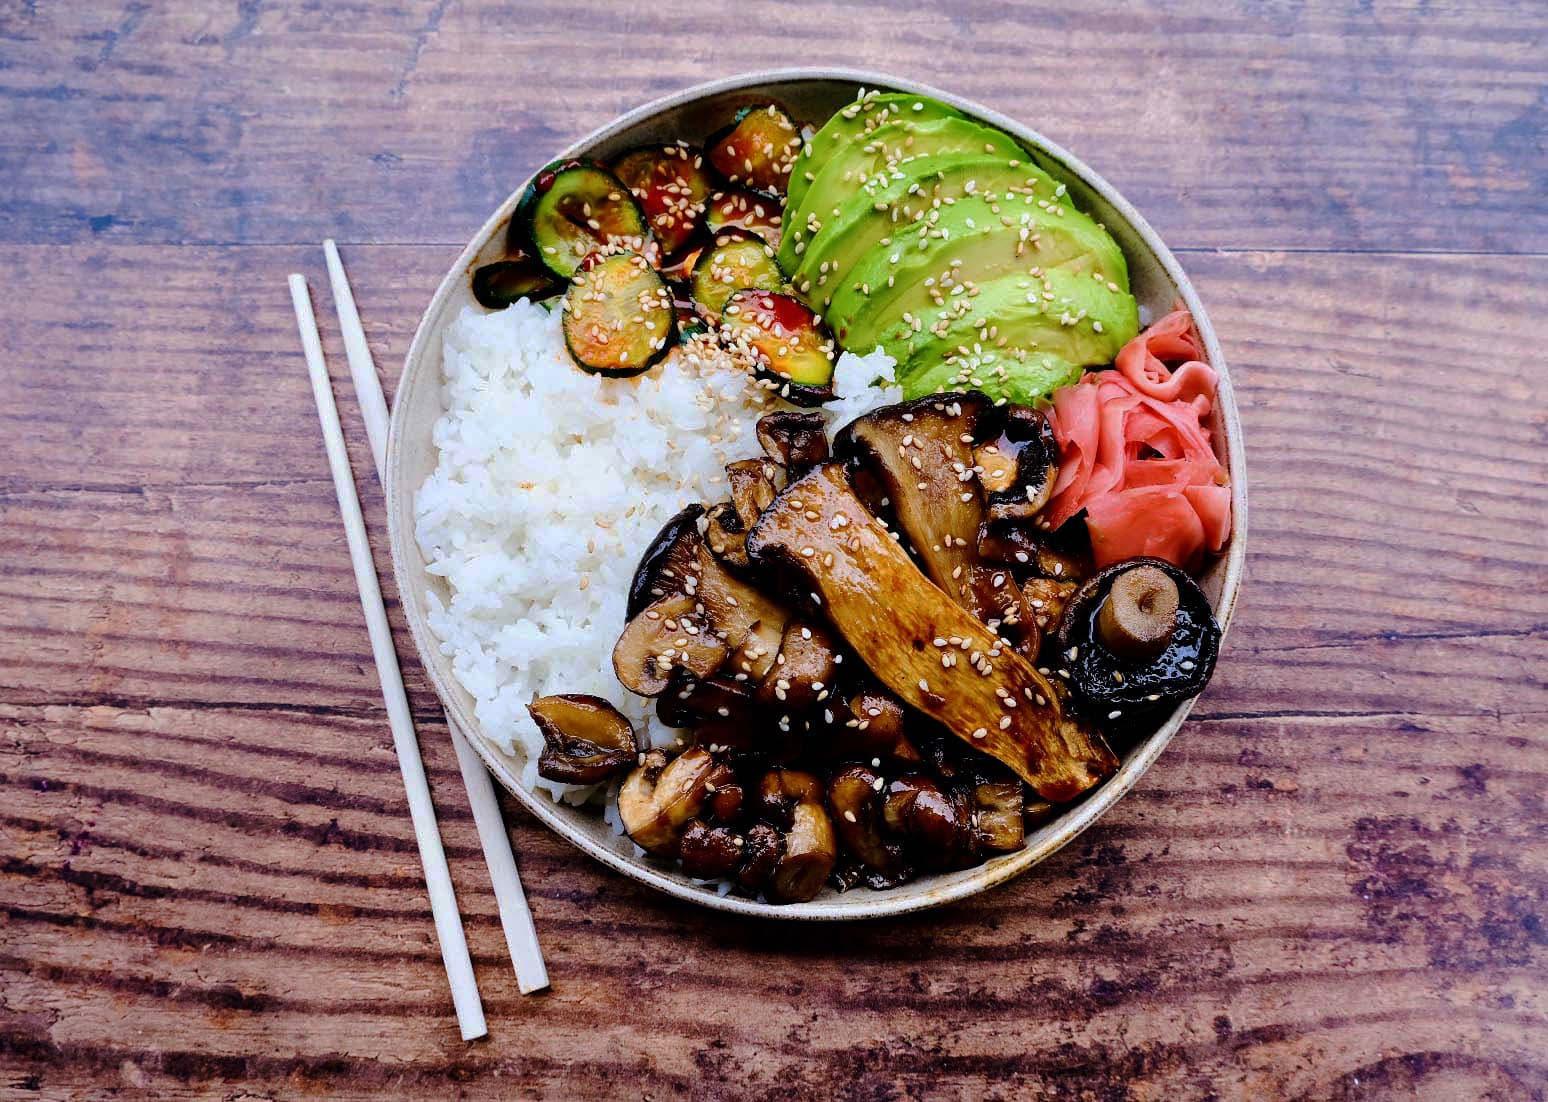 Mushroom Donburi Bowl with Spicy Cucumbers